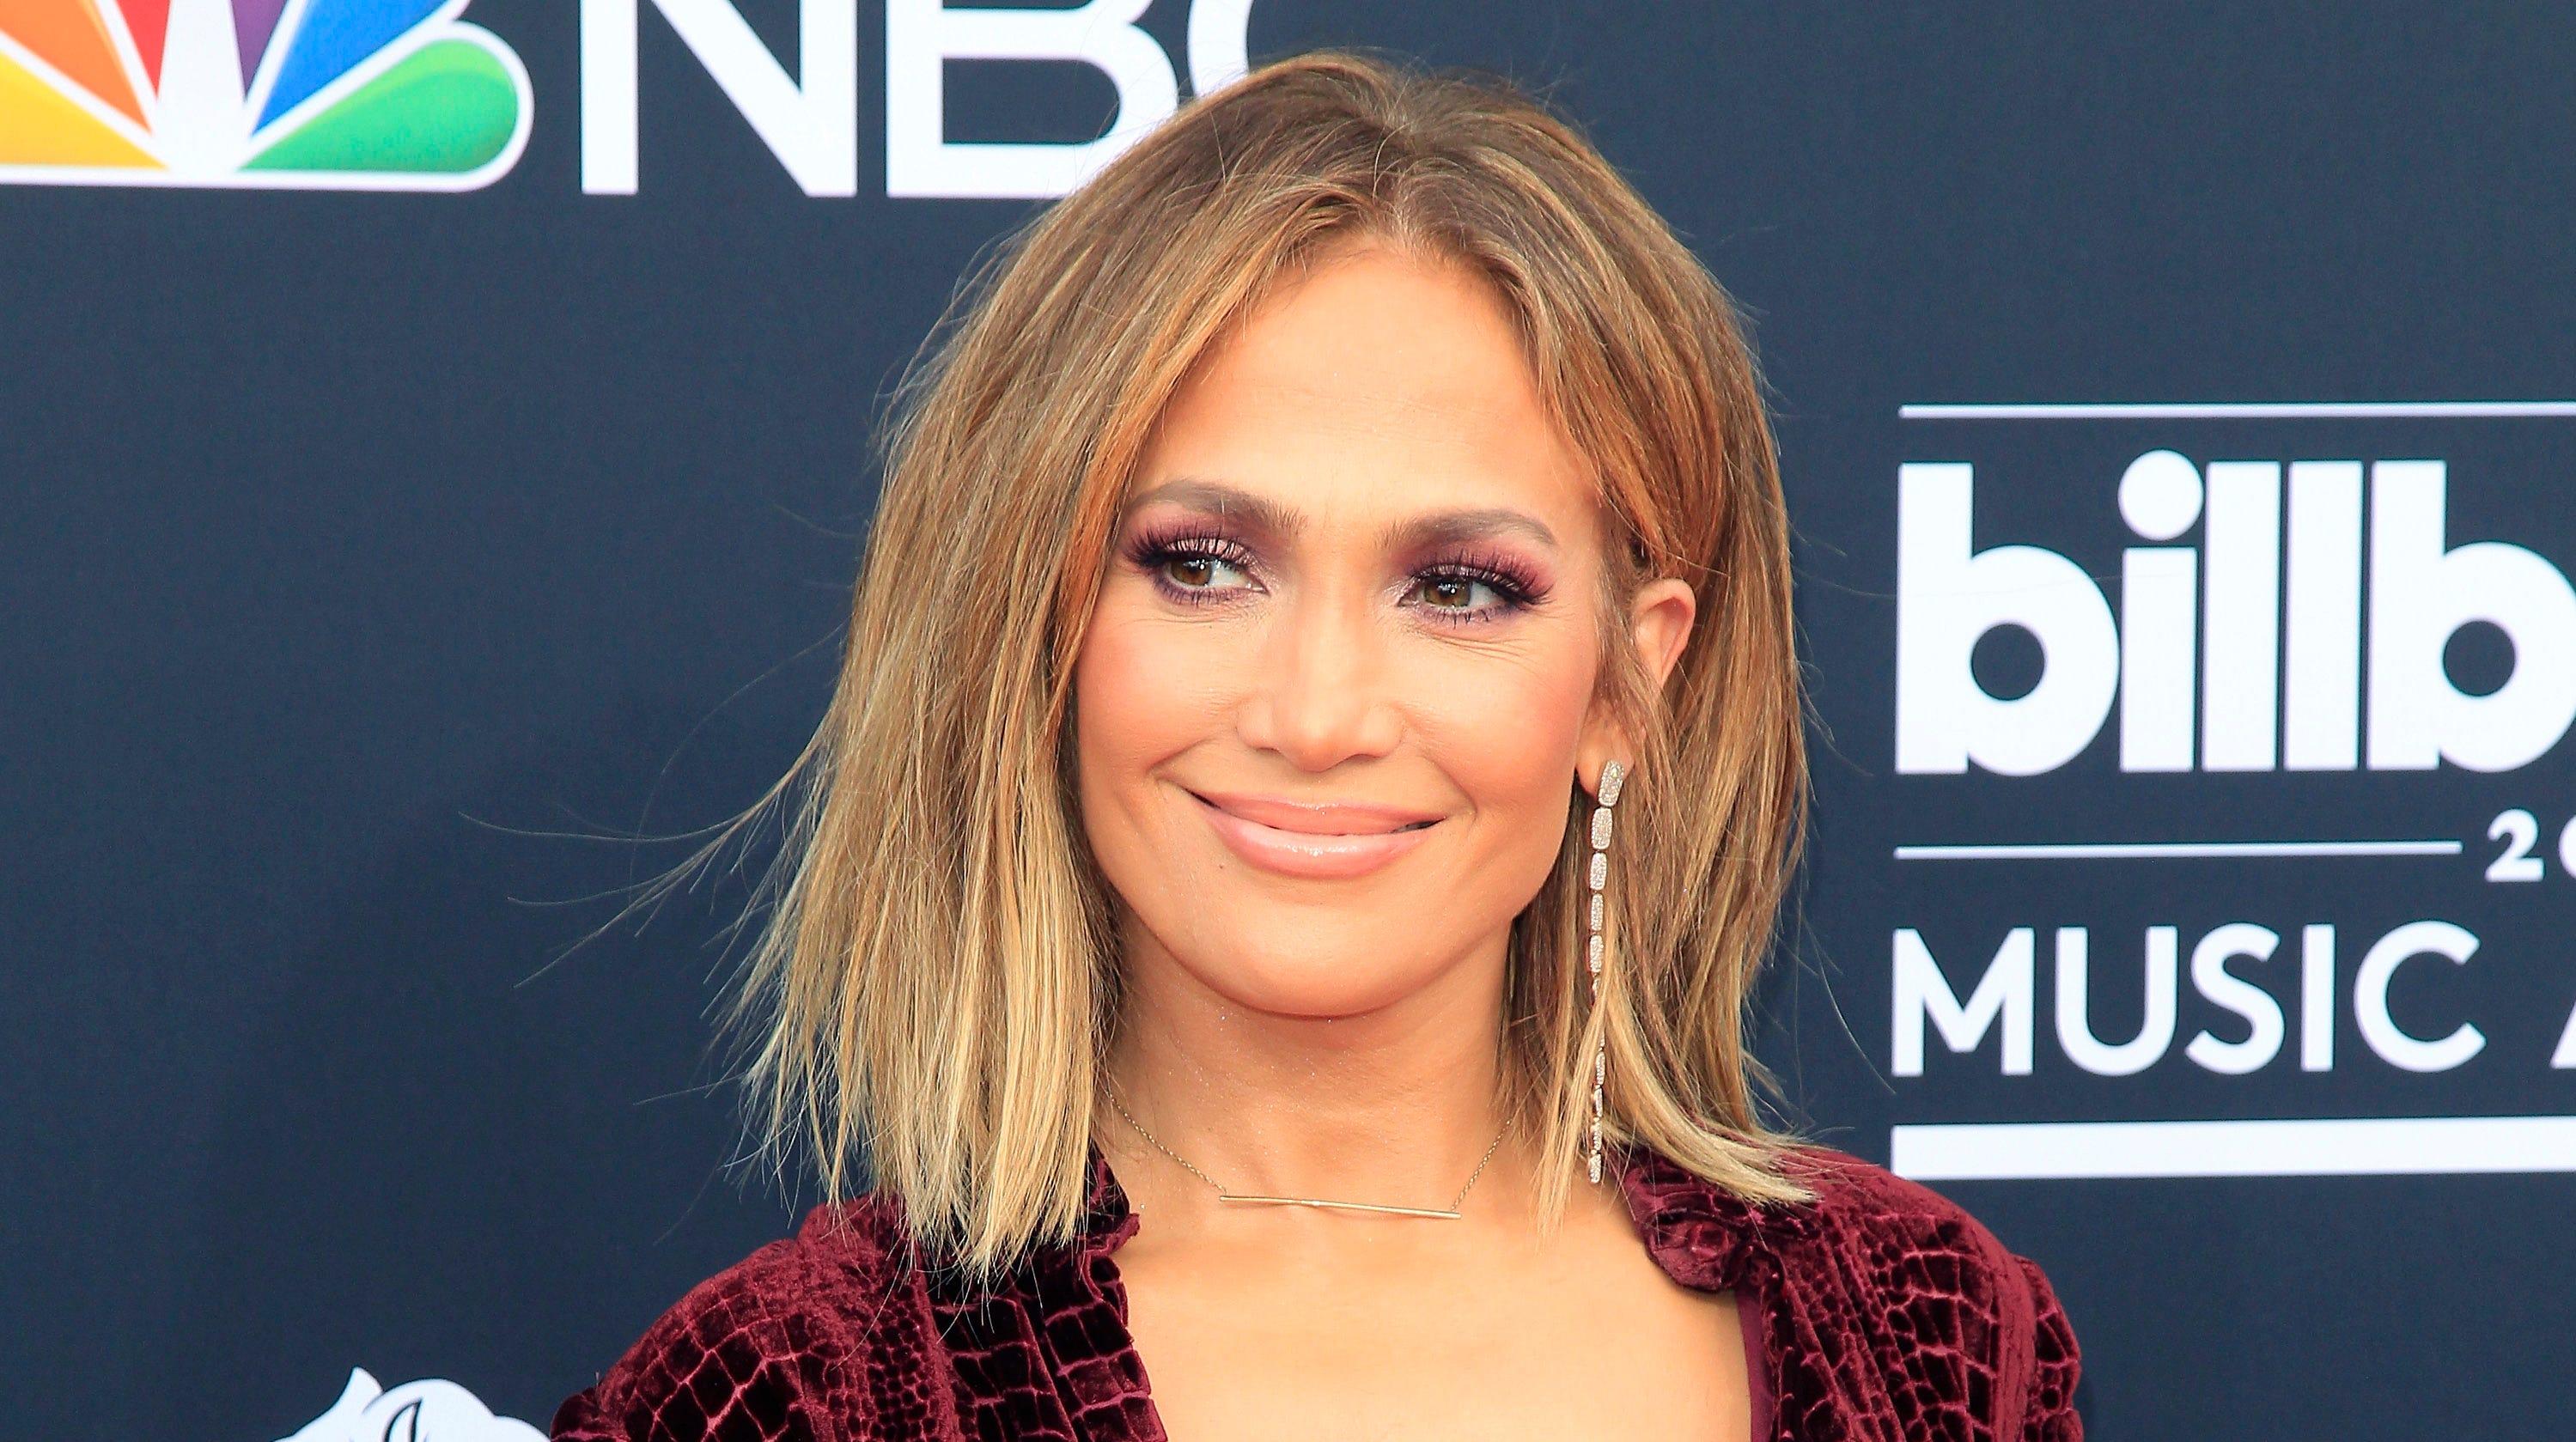 Jennifer Lopez: Jennifer Lopez's Abs Are On Amazing Display In Birthday